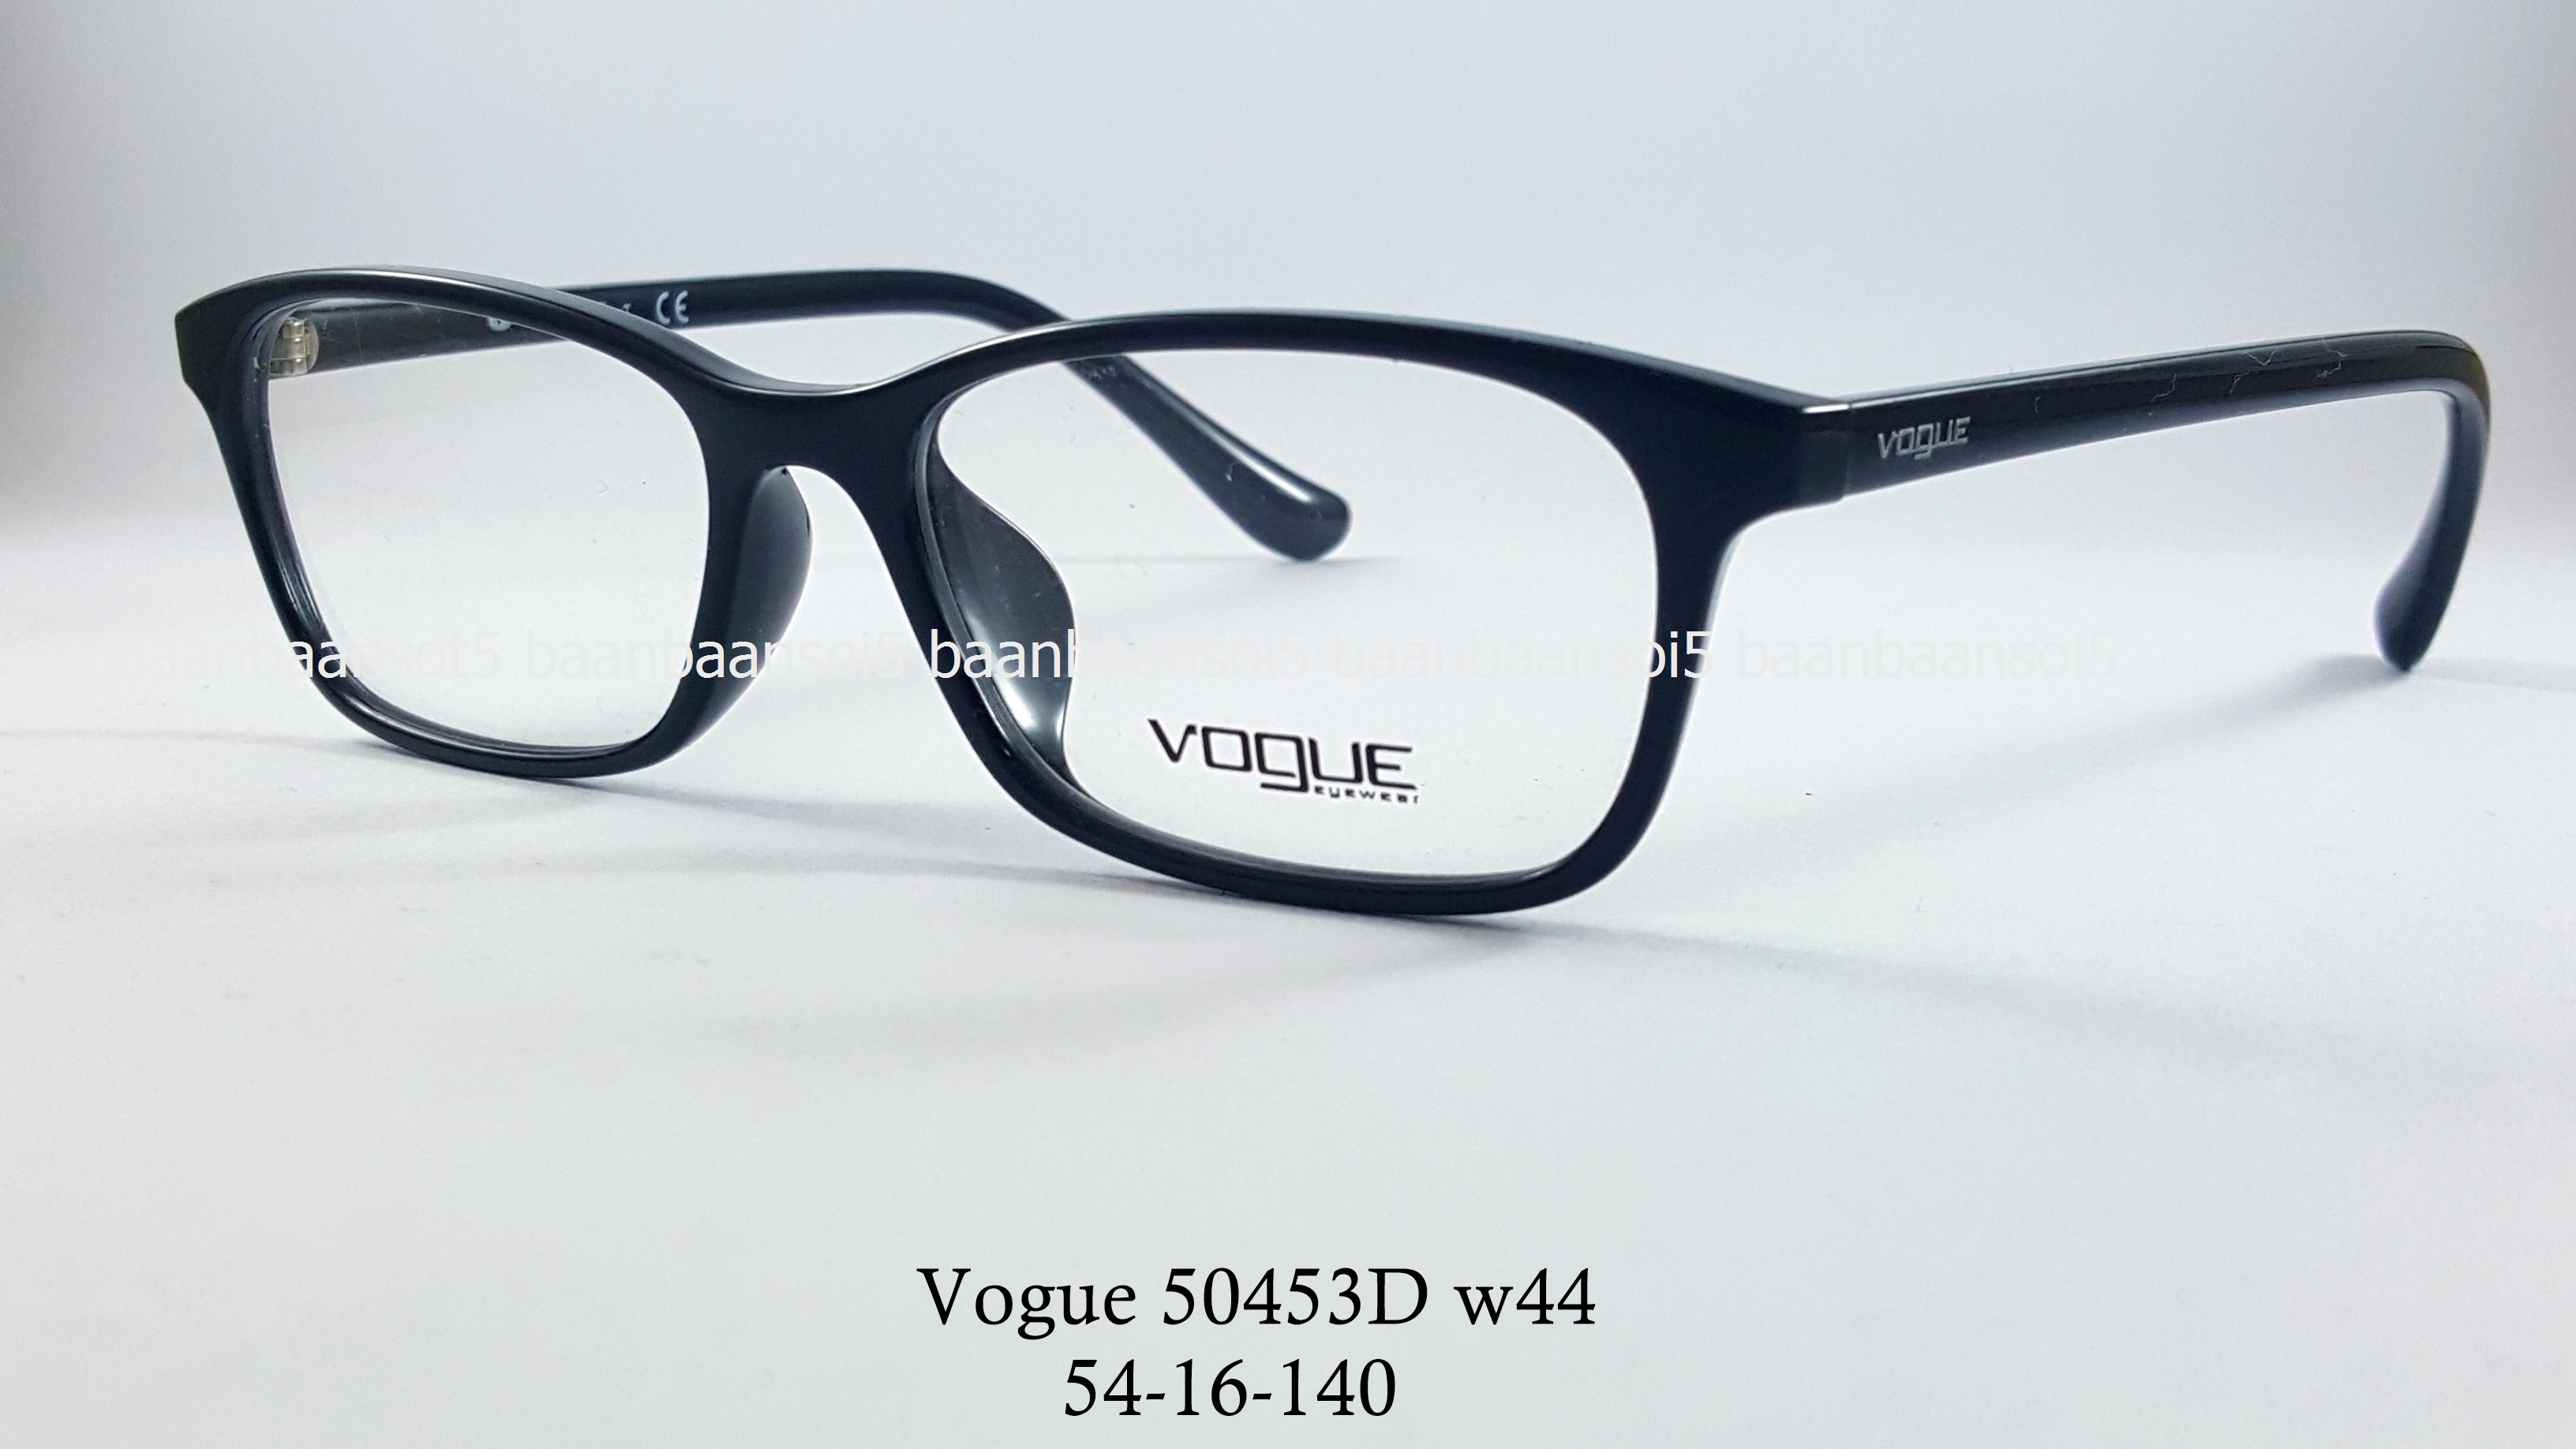 Vogue vo 5053F w44 โปรโมชั่น กรอบแว่นตาพร้อมเลนส์ HOYA ราคา 2,900 บาท